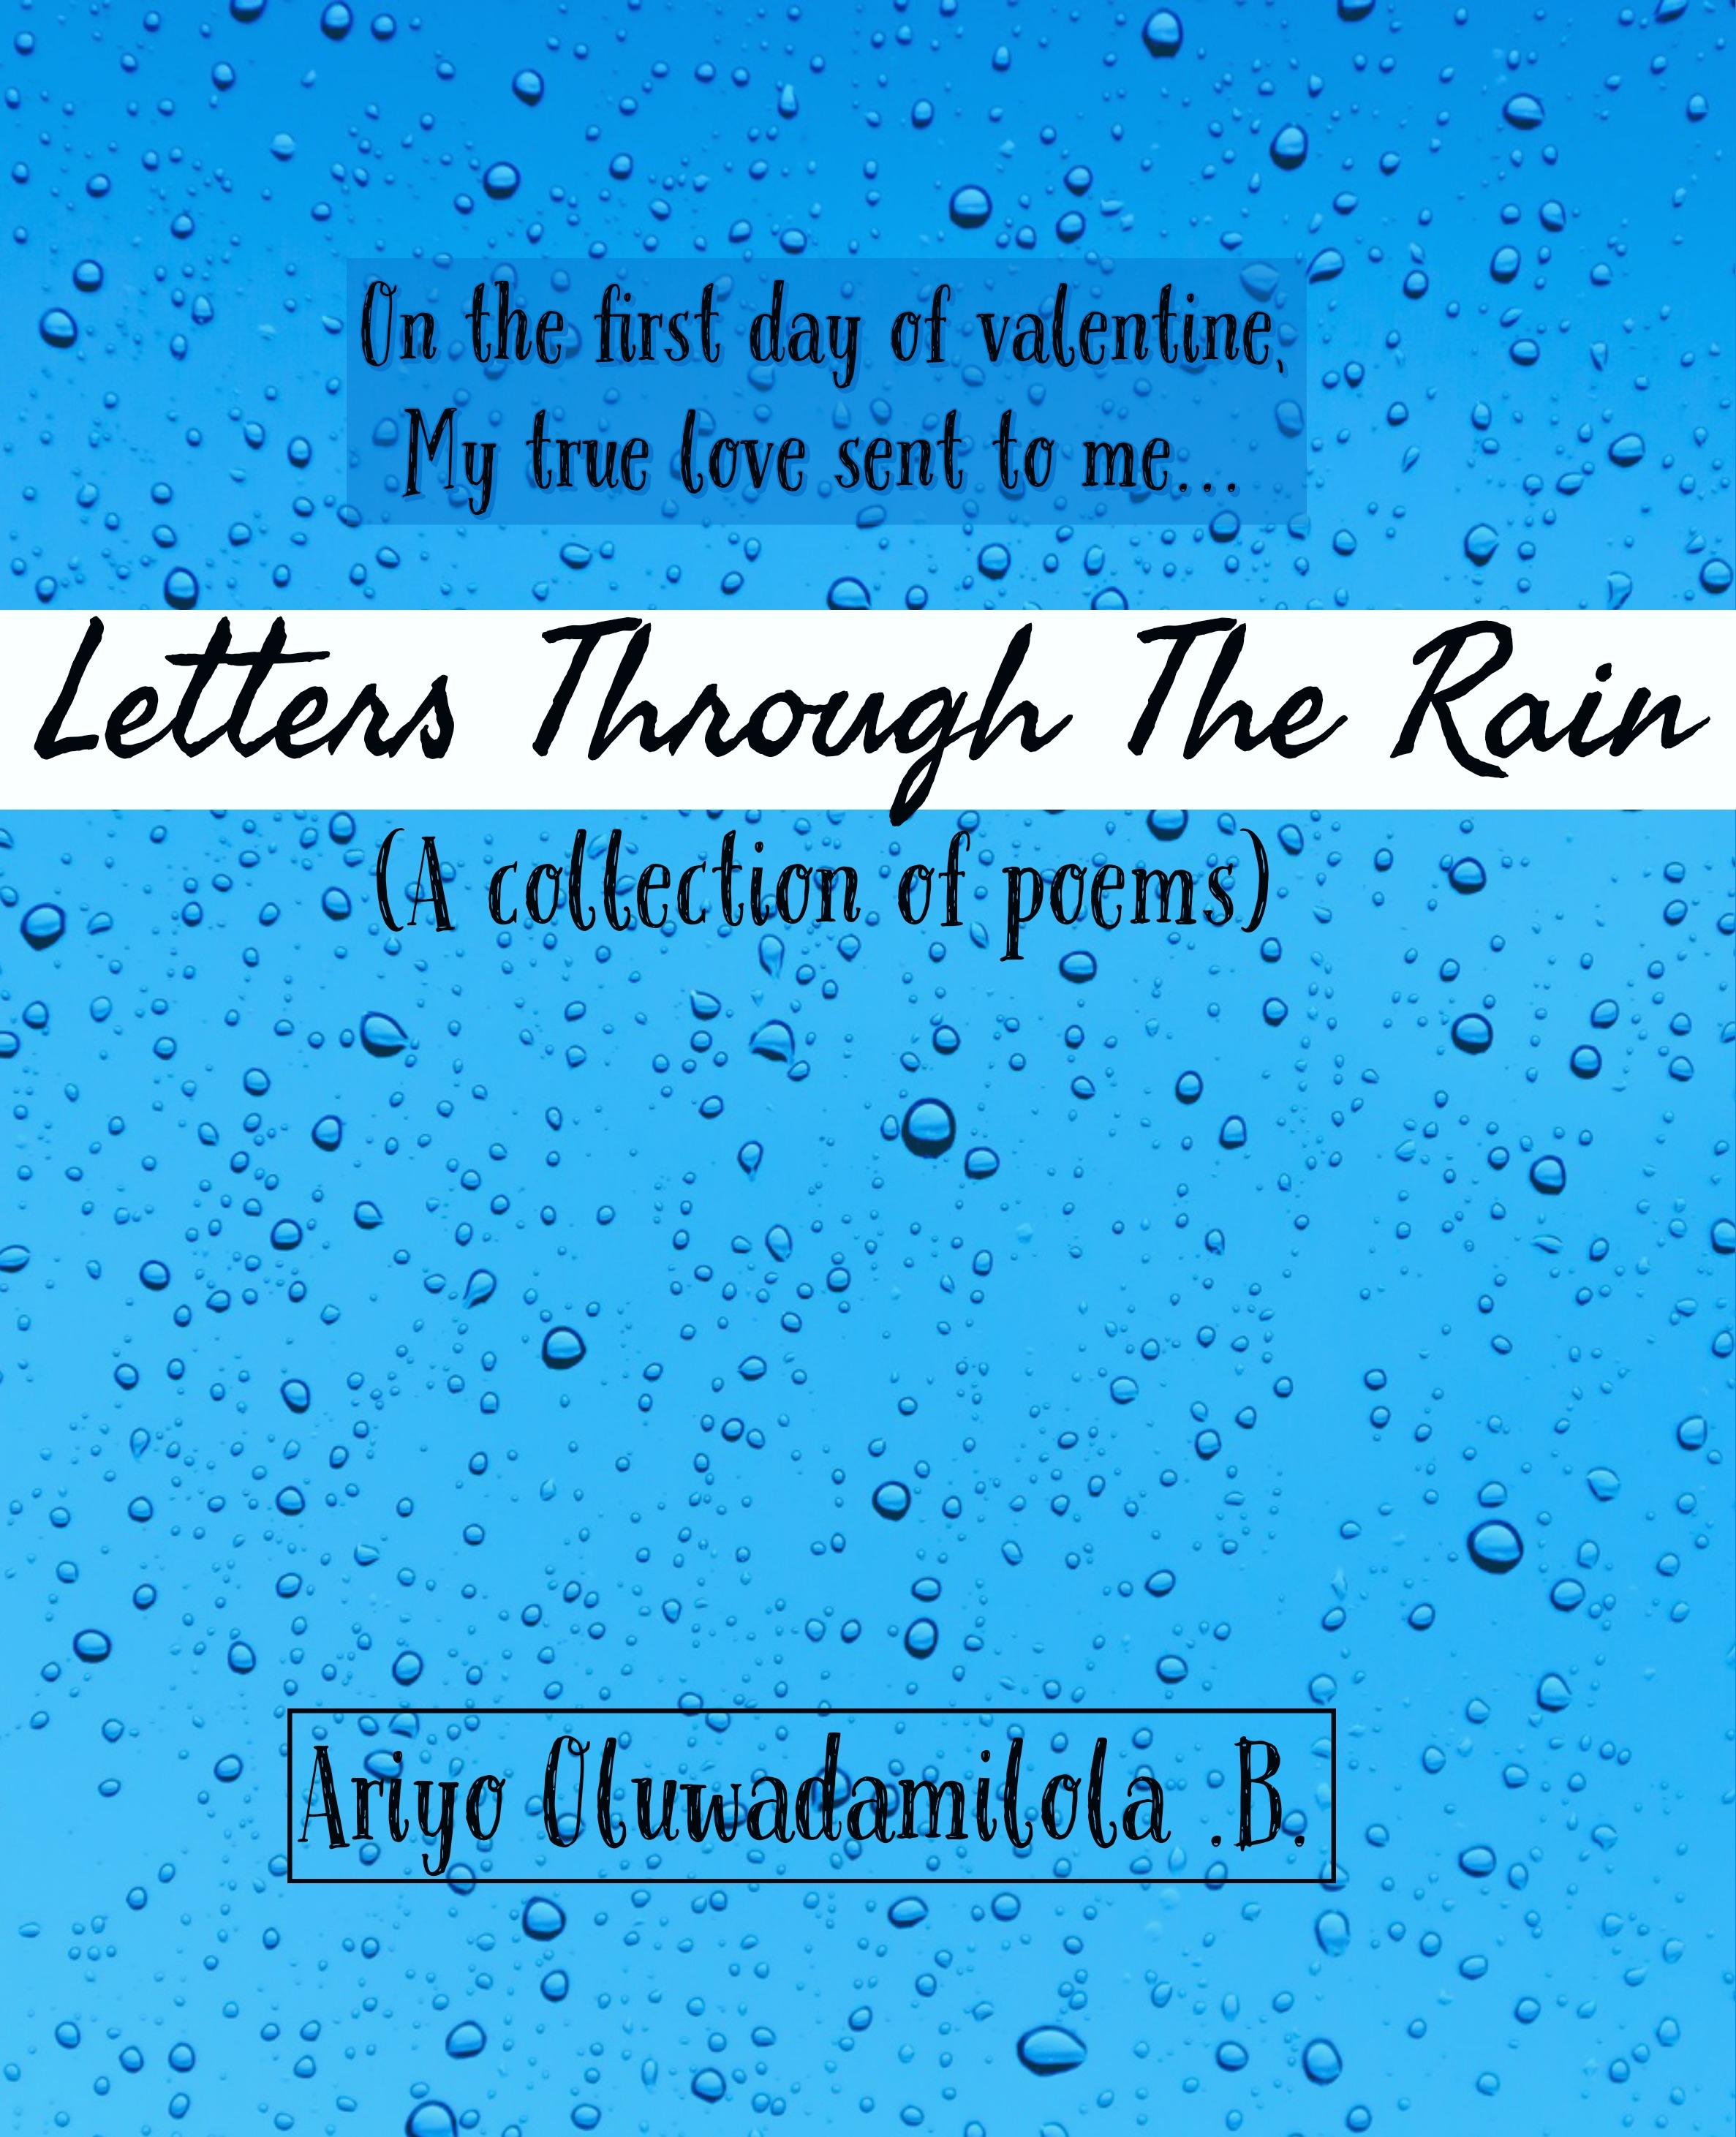 LETTERS THROUGH THE RAIN